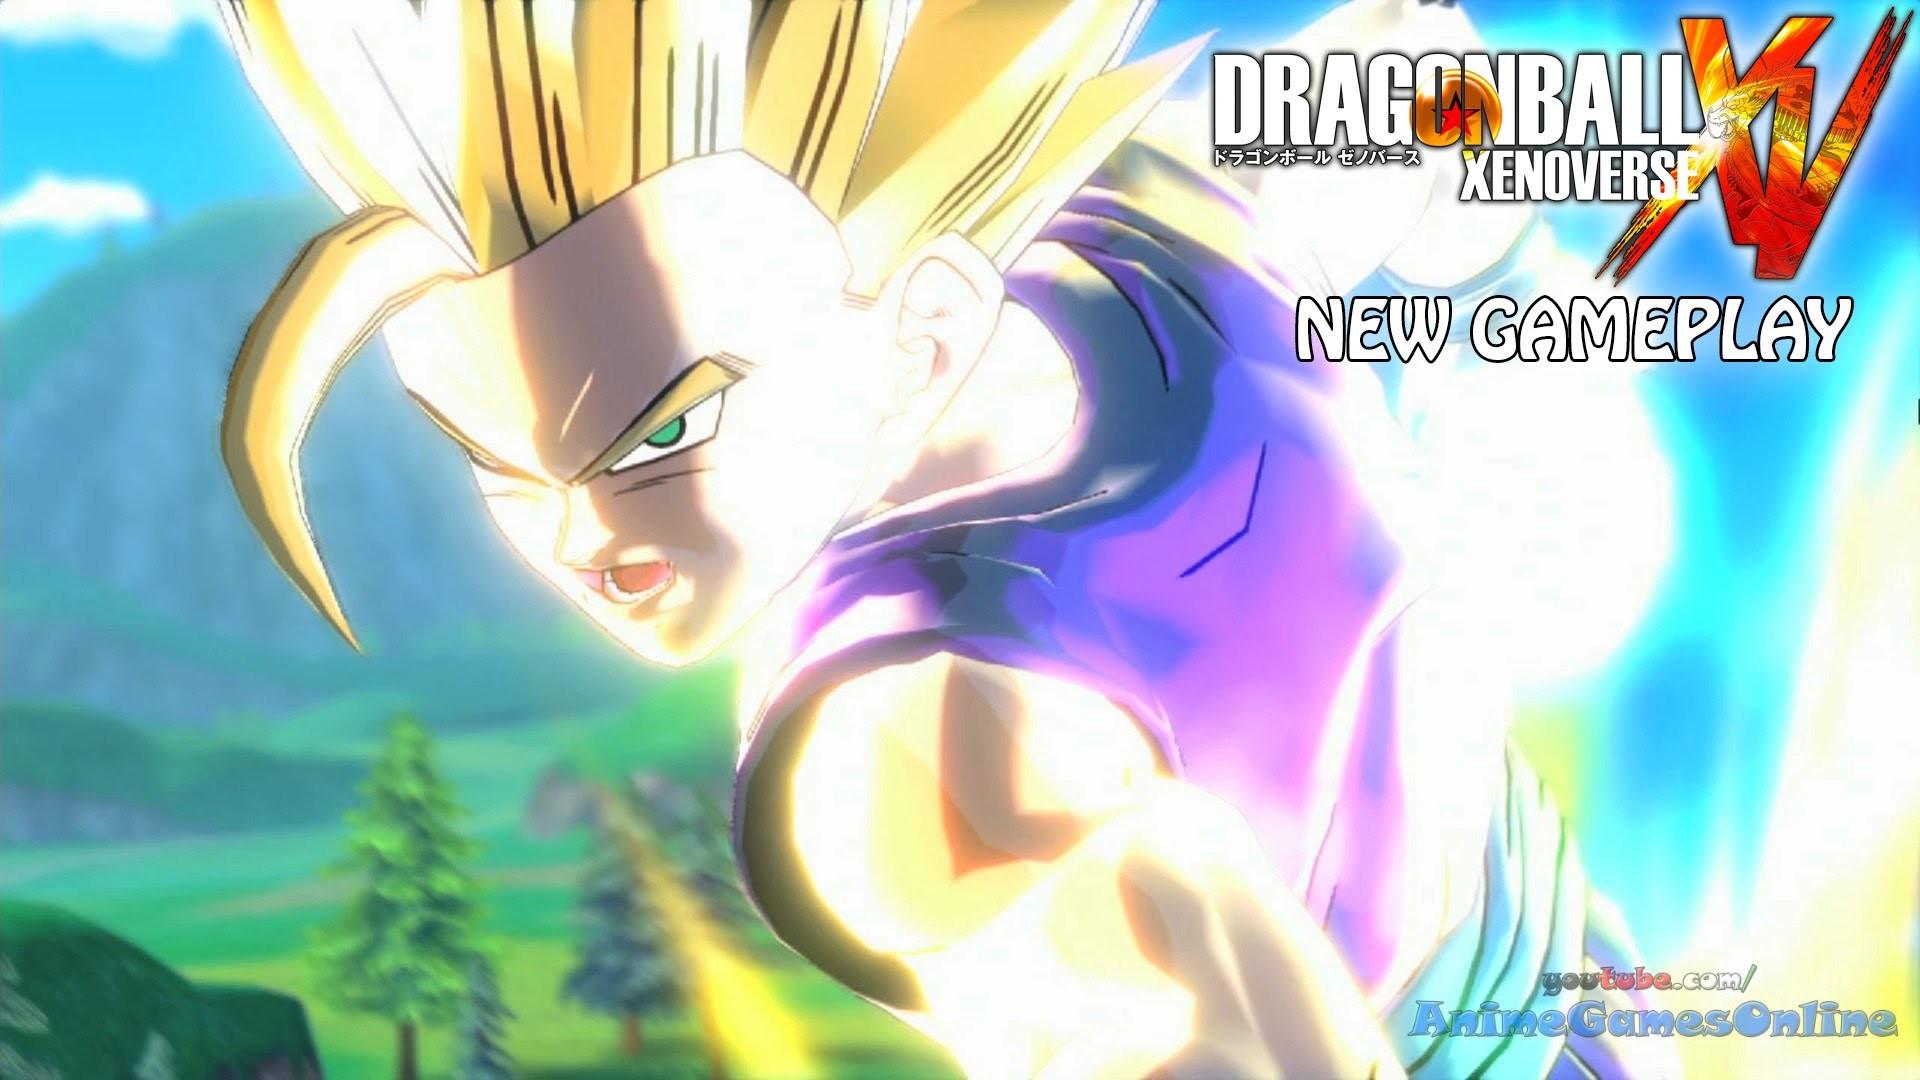 Res: 1920x1080, Dragon Ball Xenoverse Gameplay HD 1080p - Ultimate Gohan / Super Vegito vs  Buu, SS2 Gohan vs Cell - YouTube